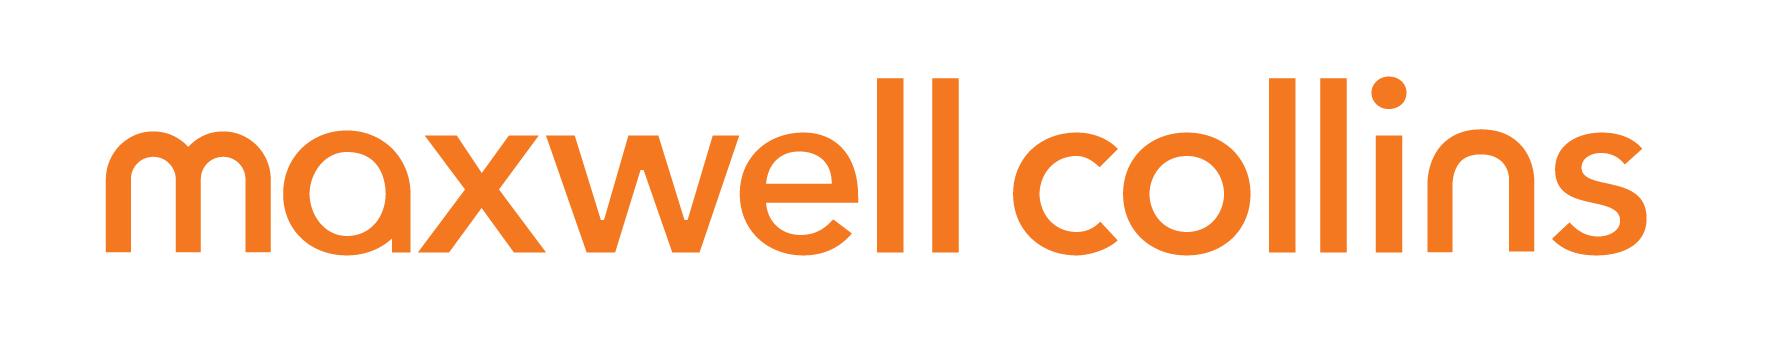 maxwellcollins.com.au